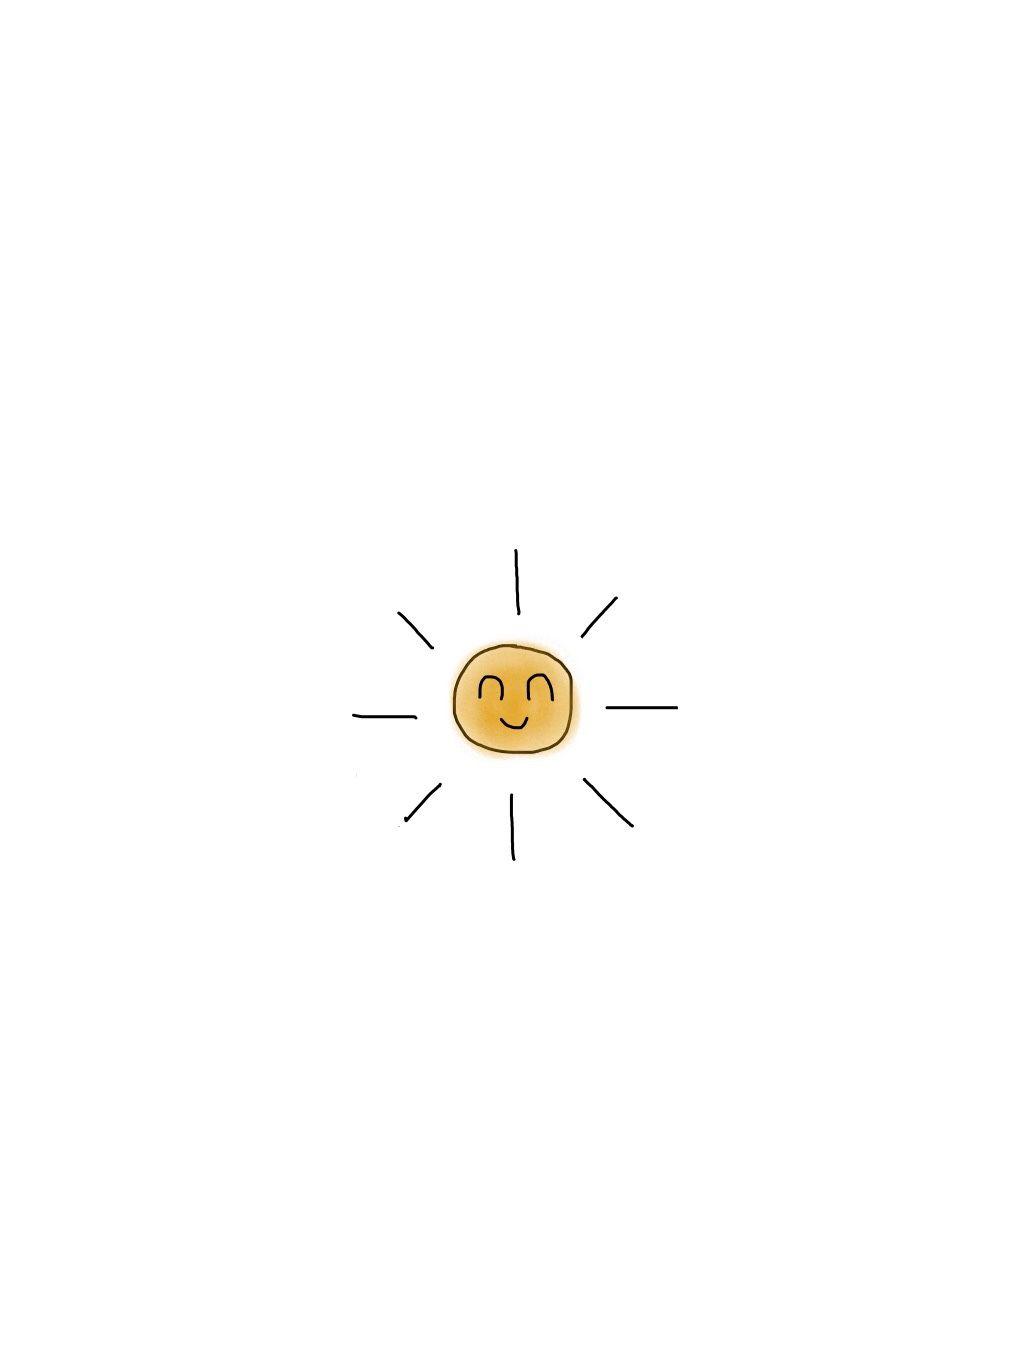 Insta And Pinterest Amymckeown5 Lockscreen In 2019 Cute